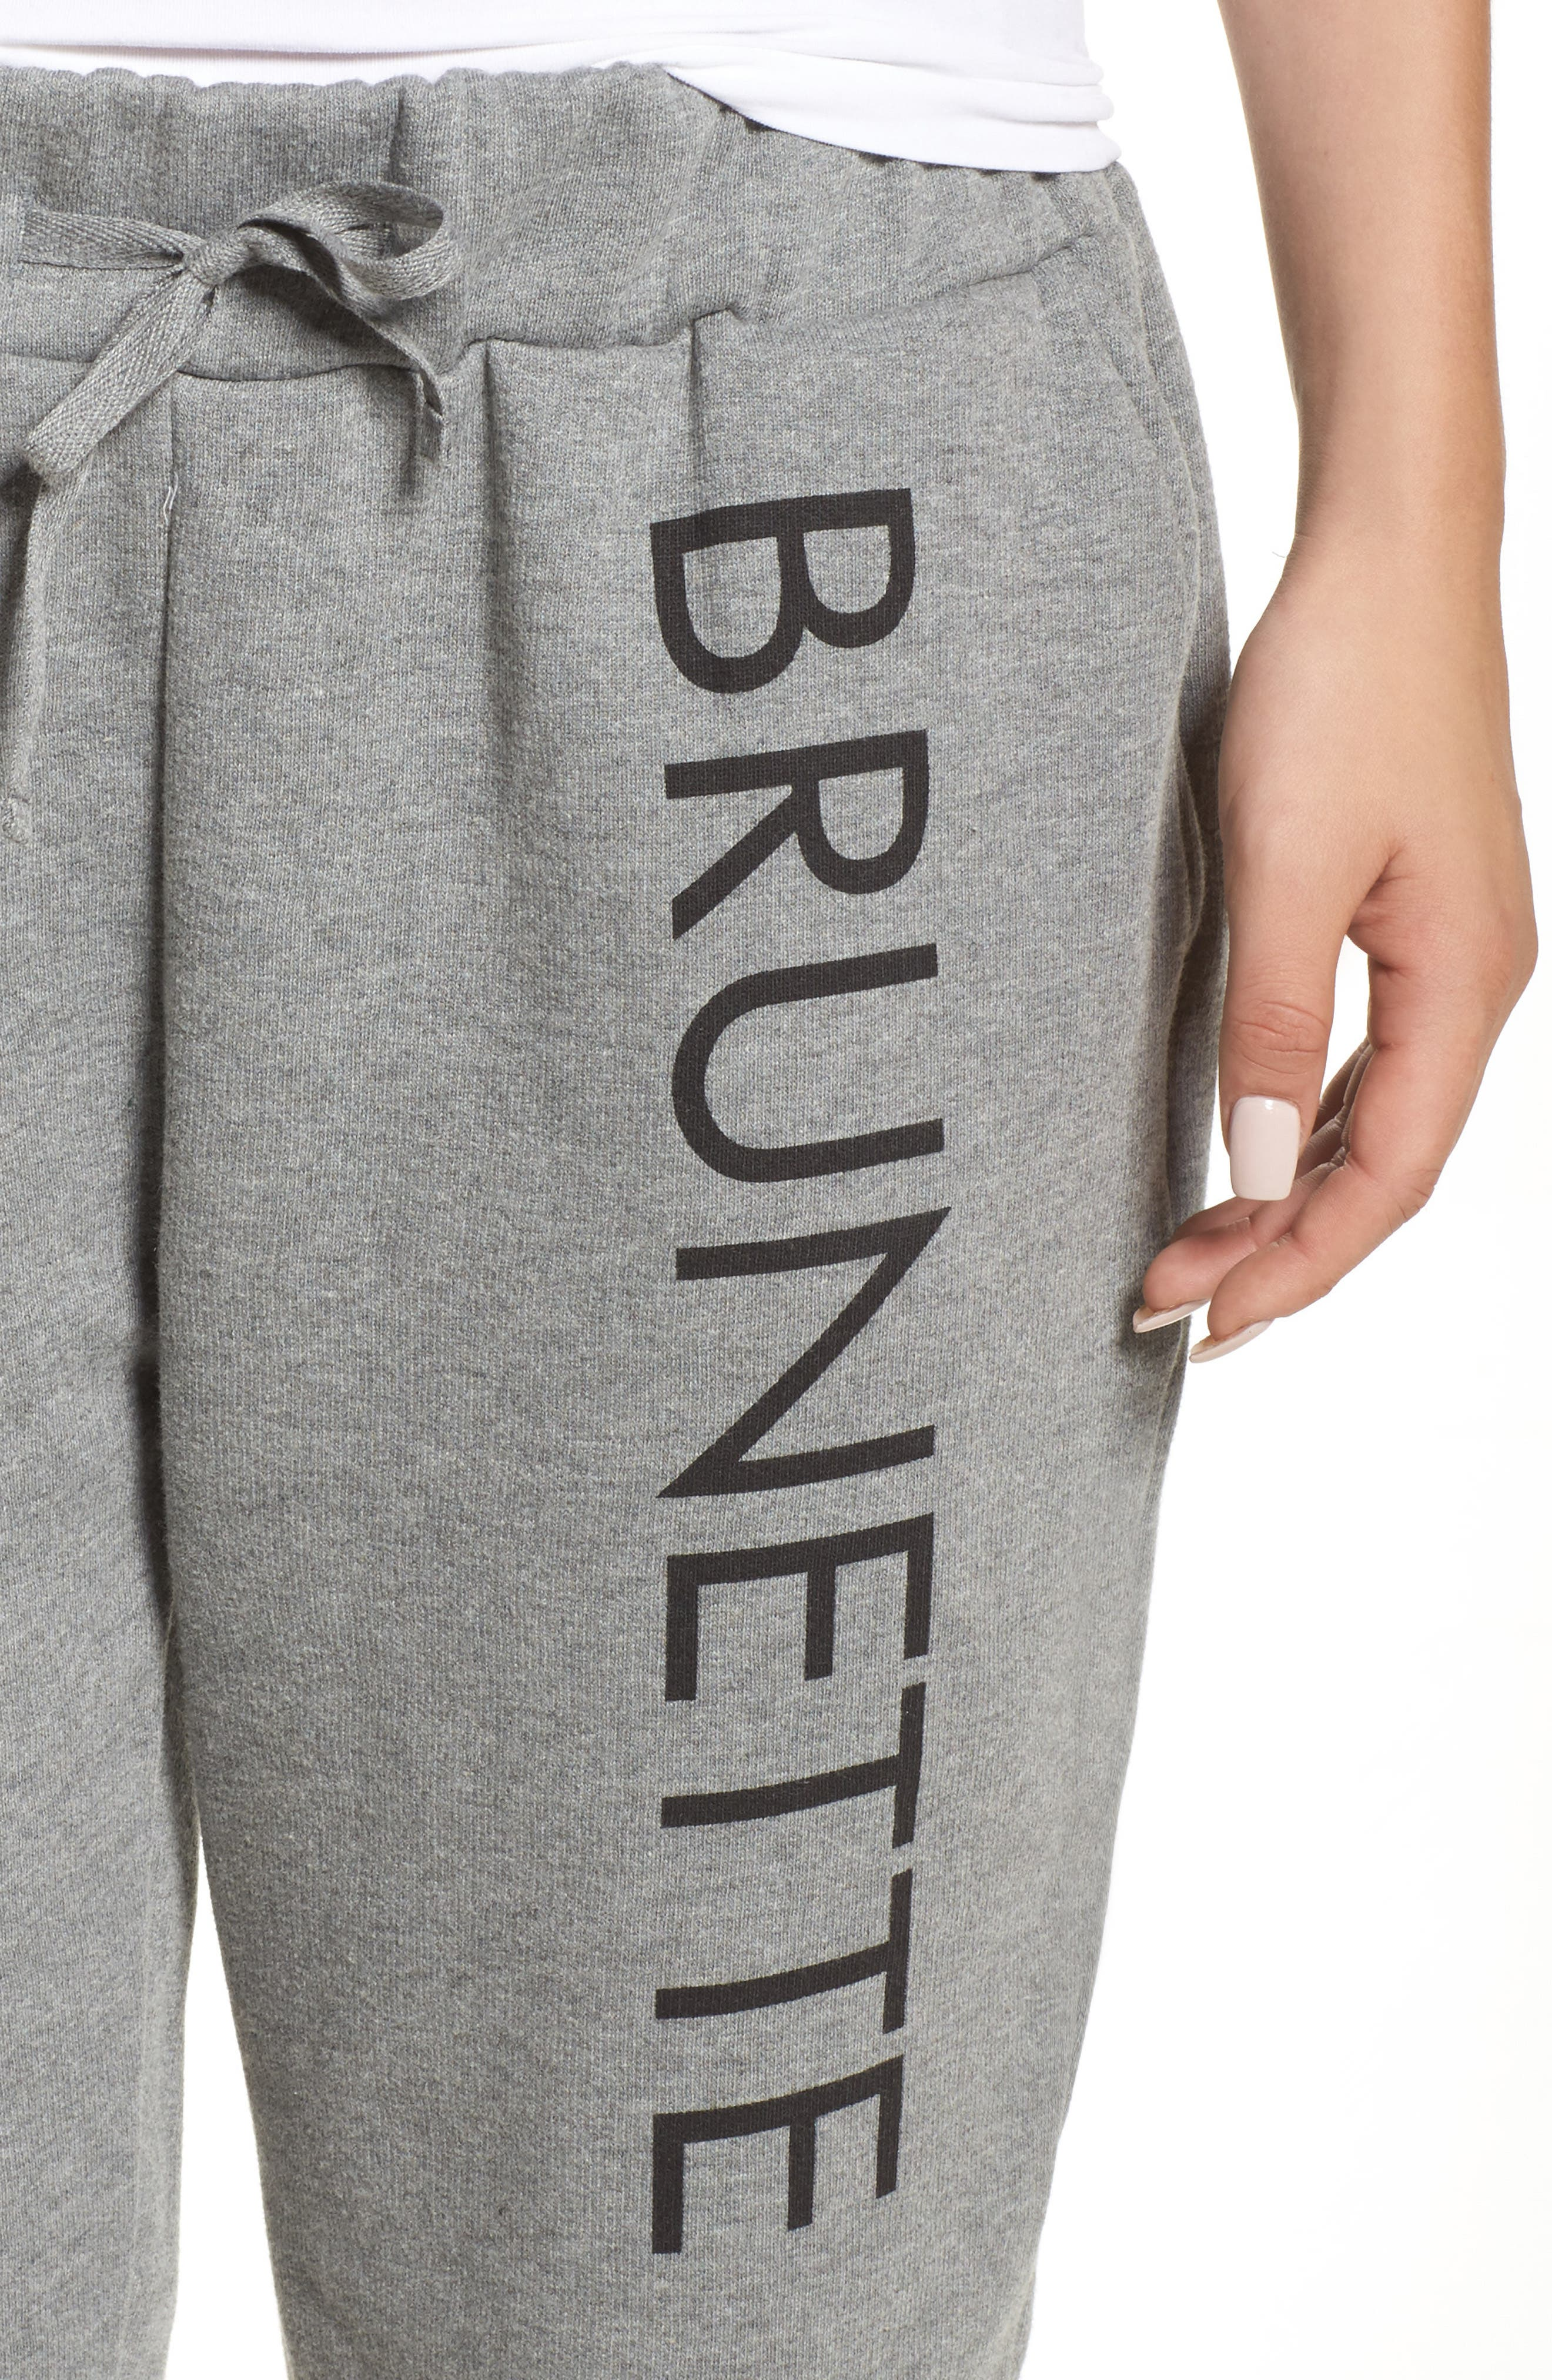 Brunette Jogger Pants,                             Alternate thumbnail 4, color,                             020